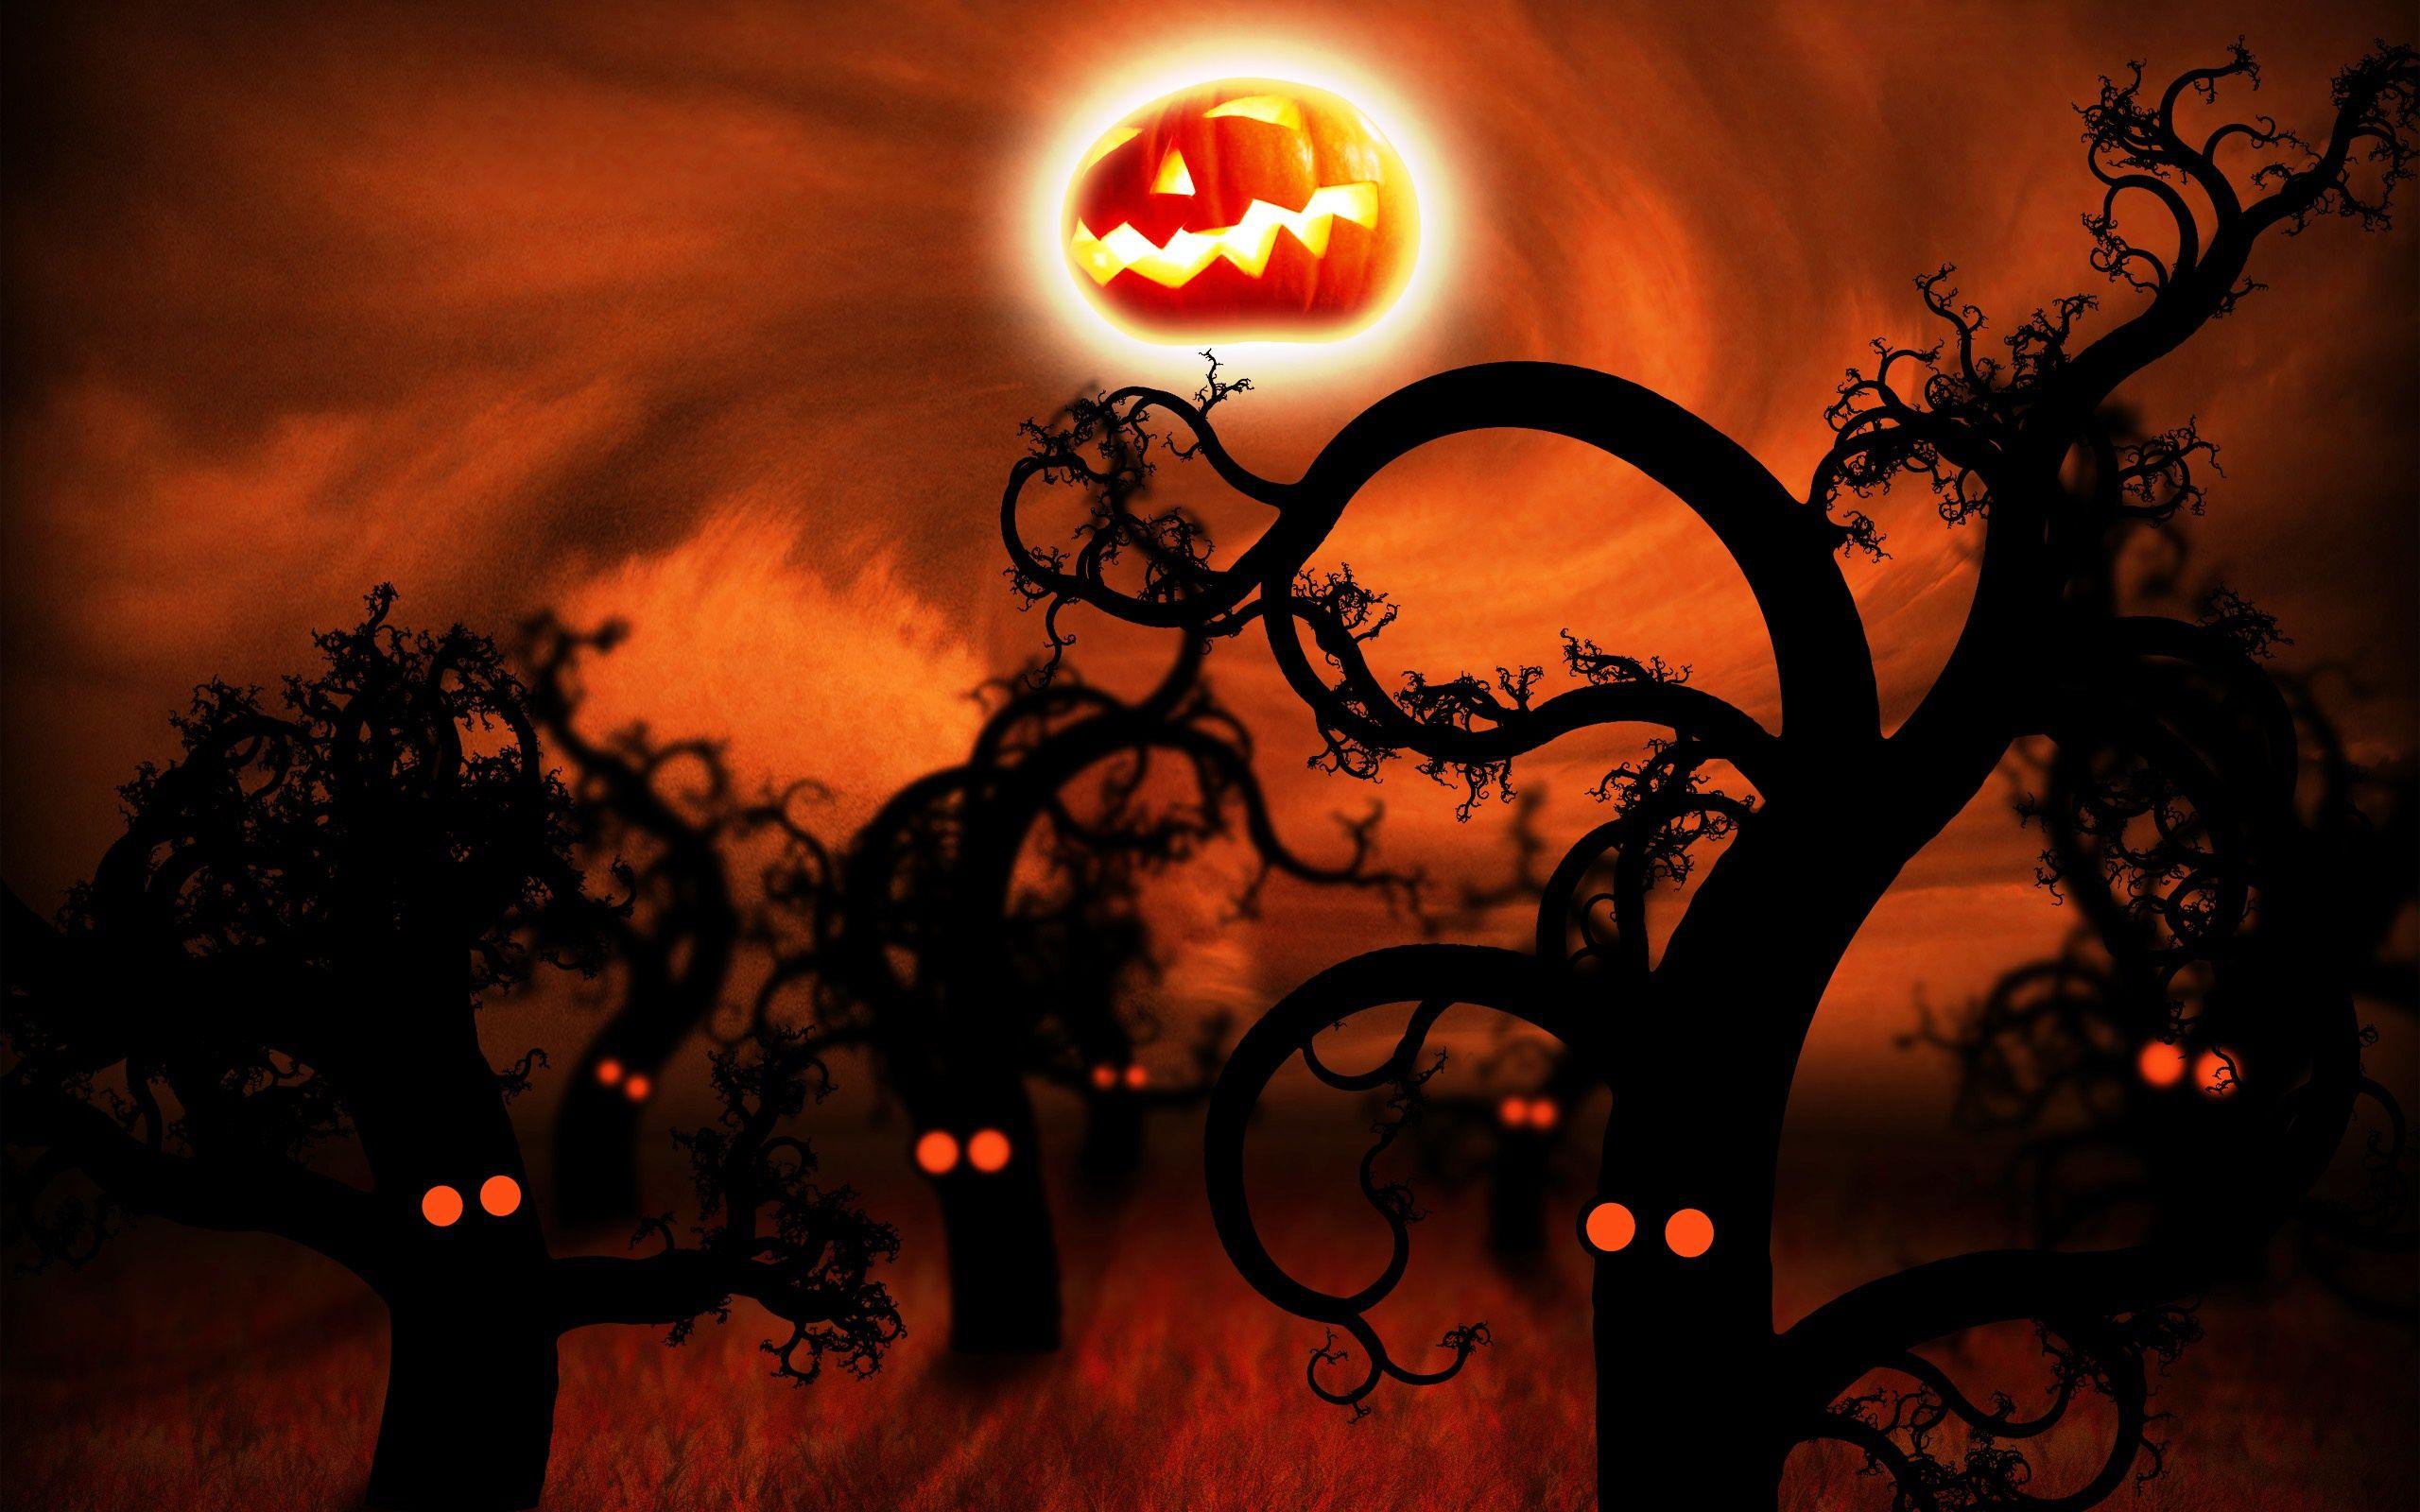 Free Animated Halloween Wallpaper Halloween Wallpaper Halloween Live Wallpaper Halloween Backgrounds